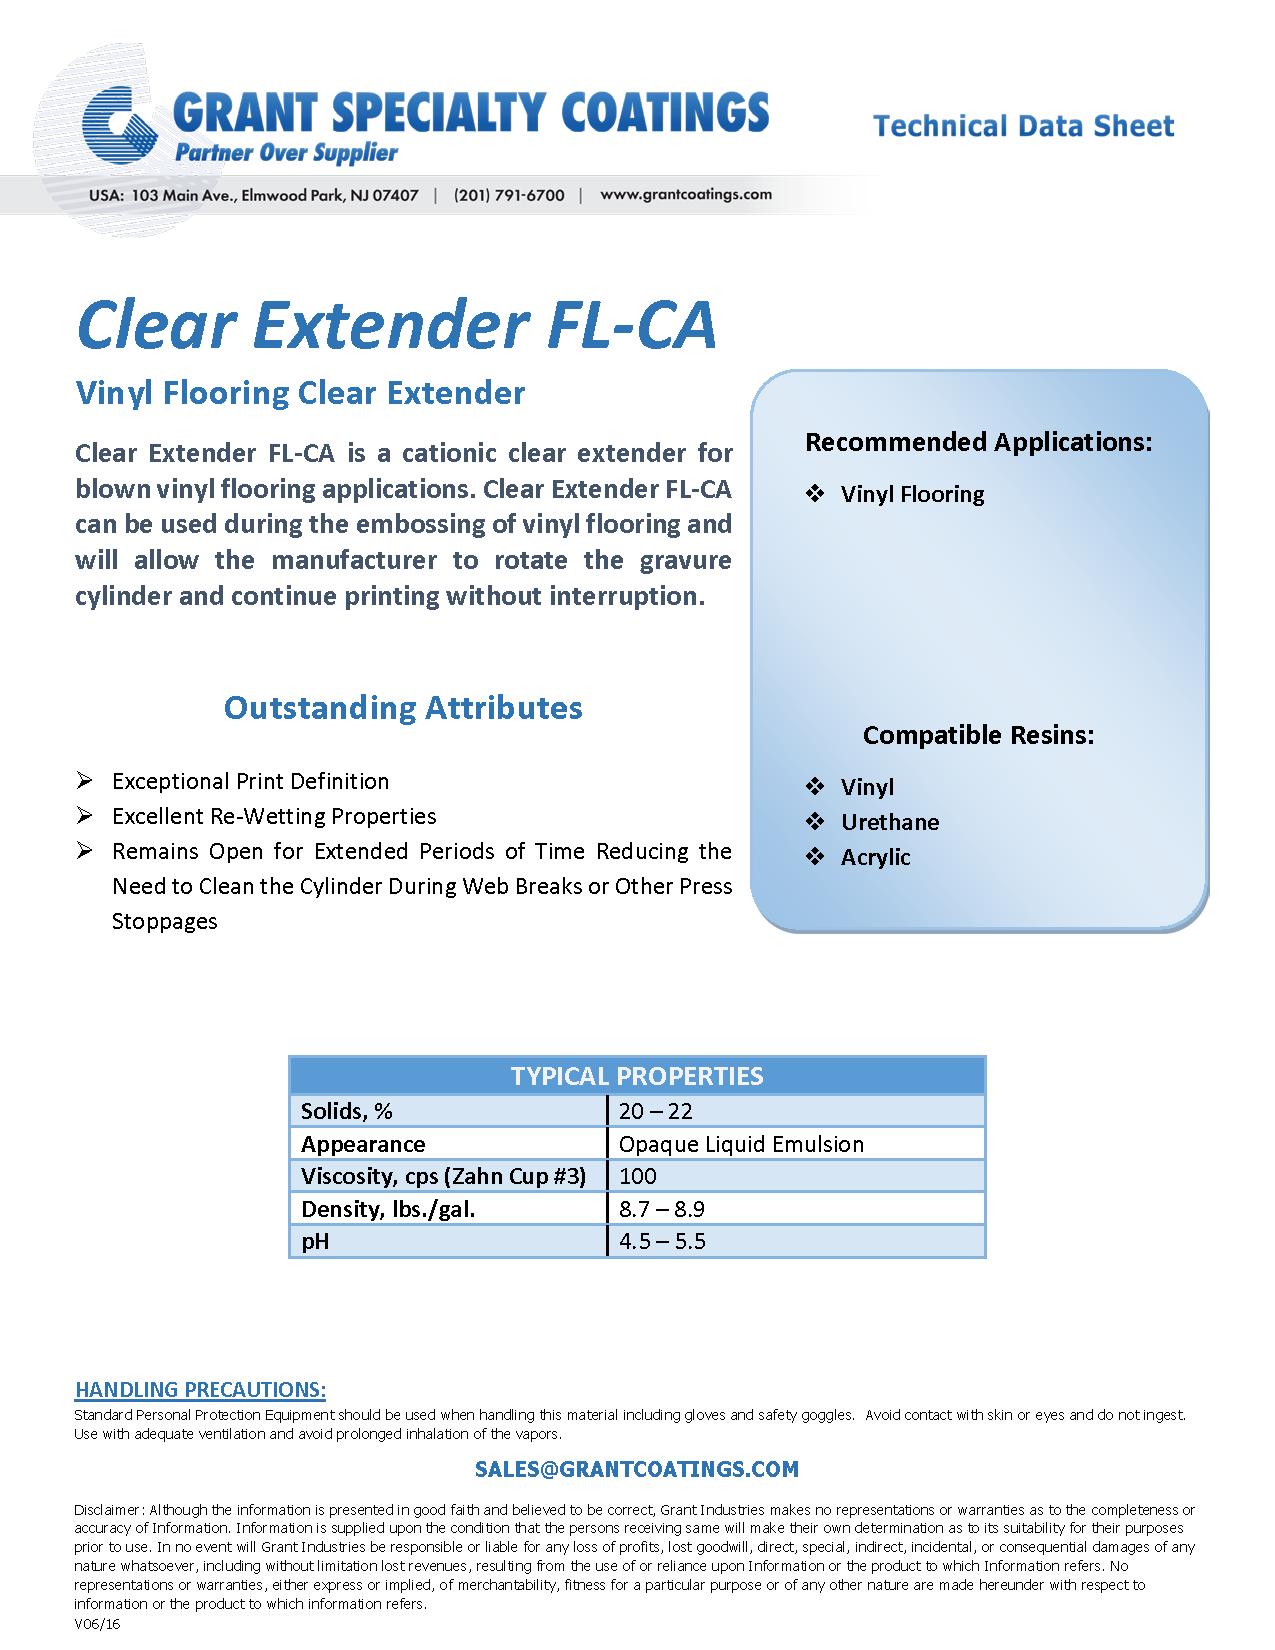 Clear Extender FL-CA for Blown Vinyl Flooring.png